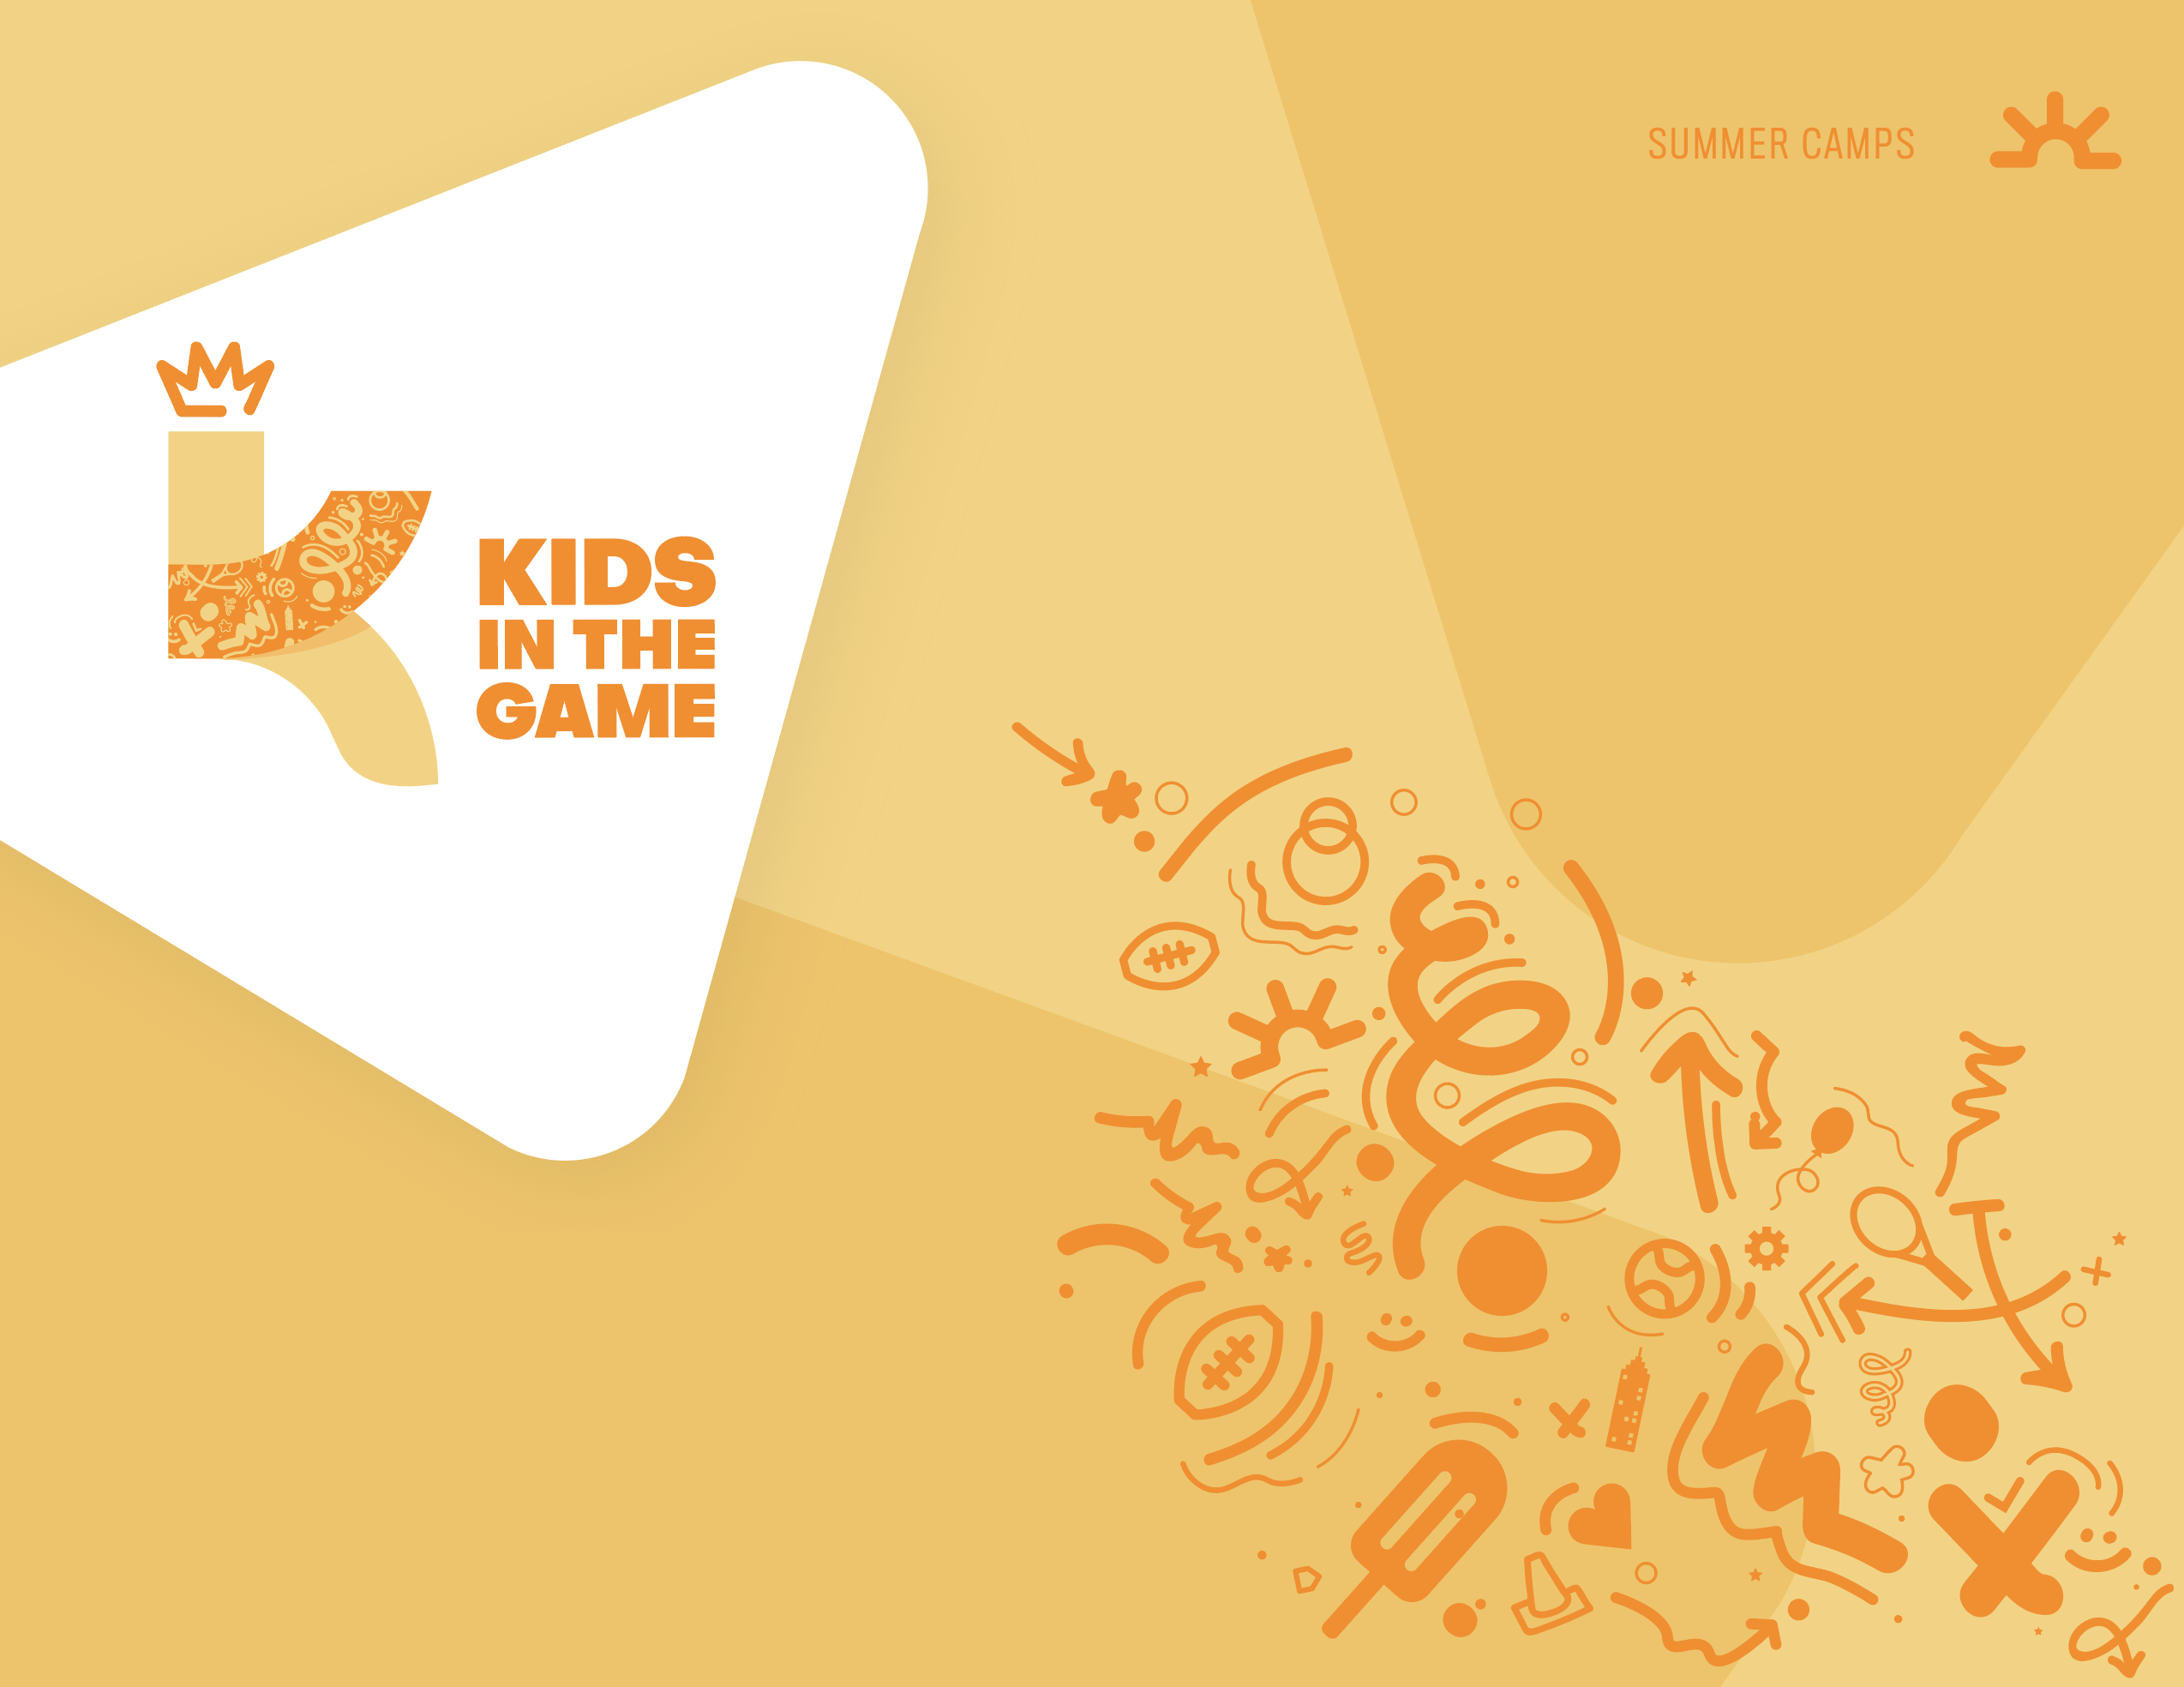 Summer camp brand design